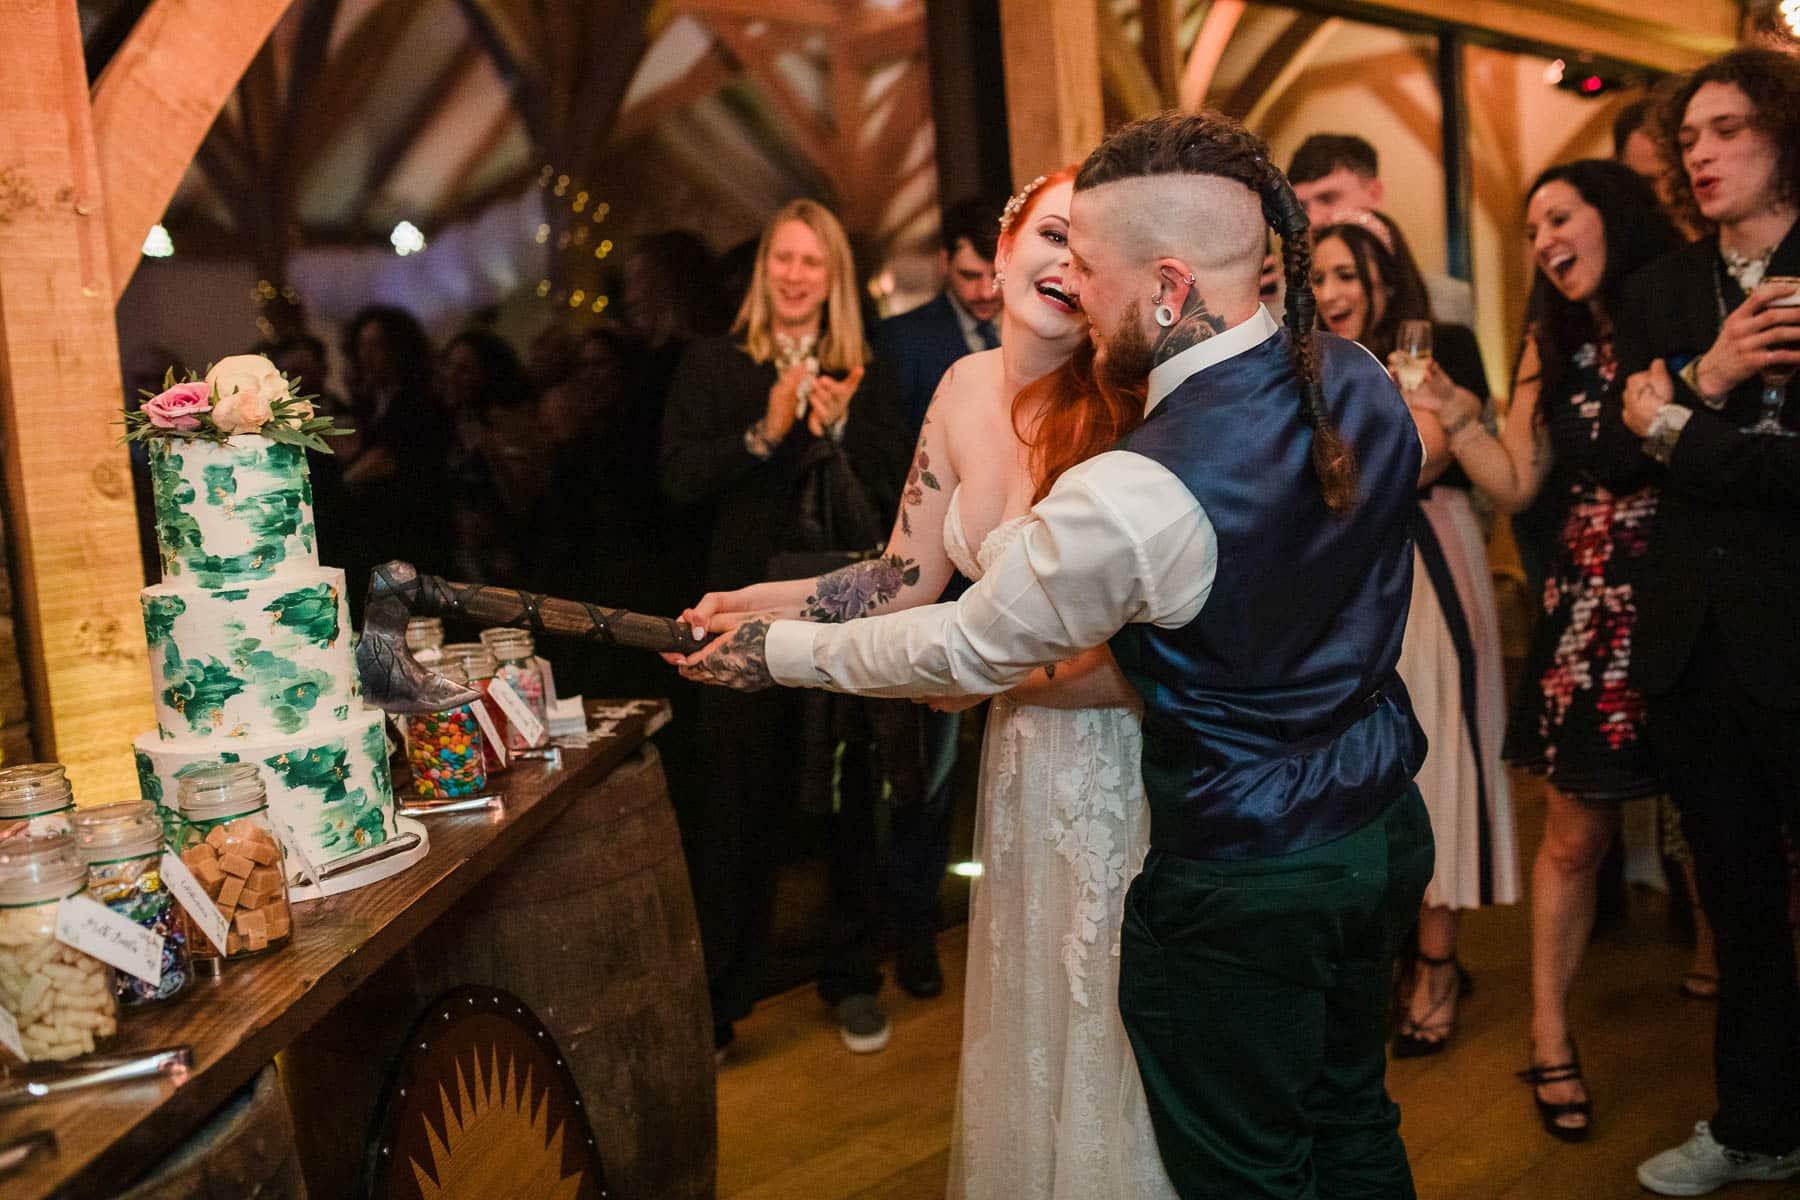 Nordic cutting the cake